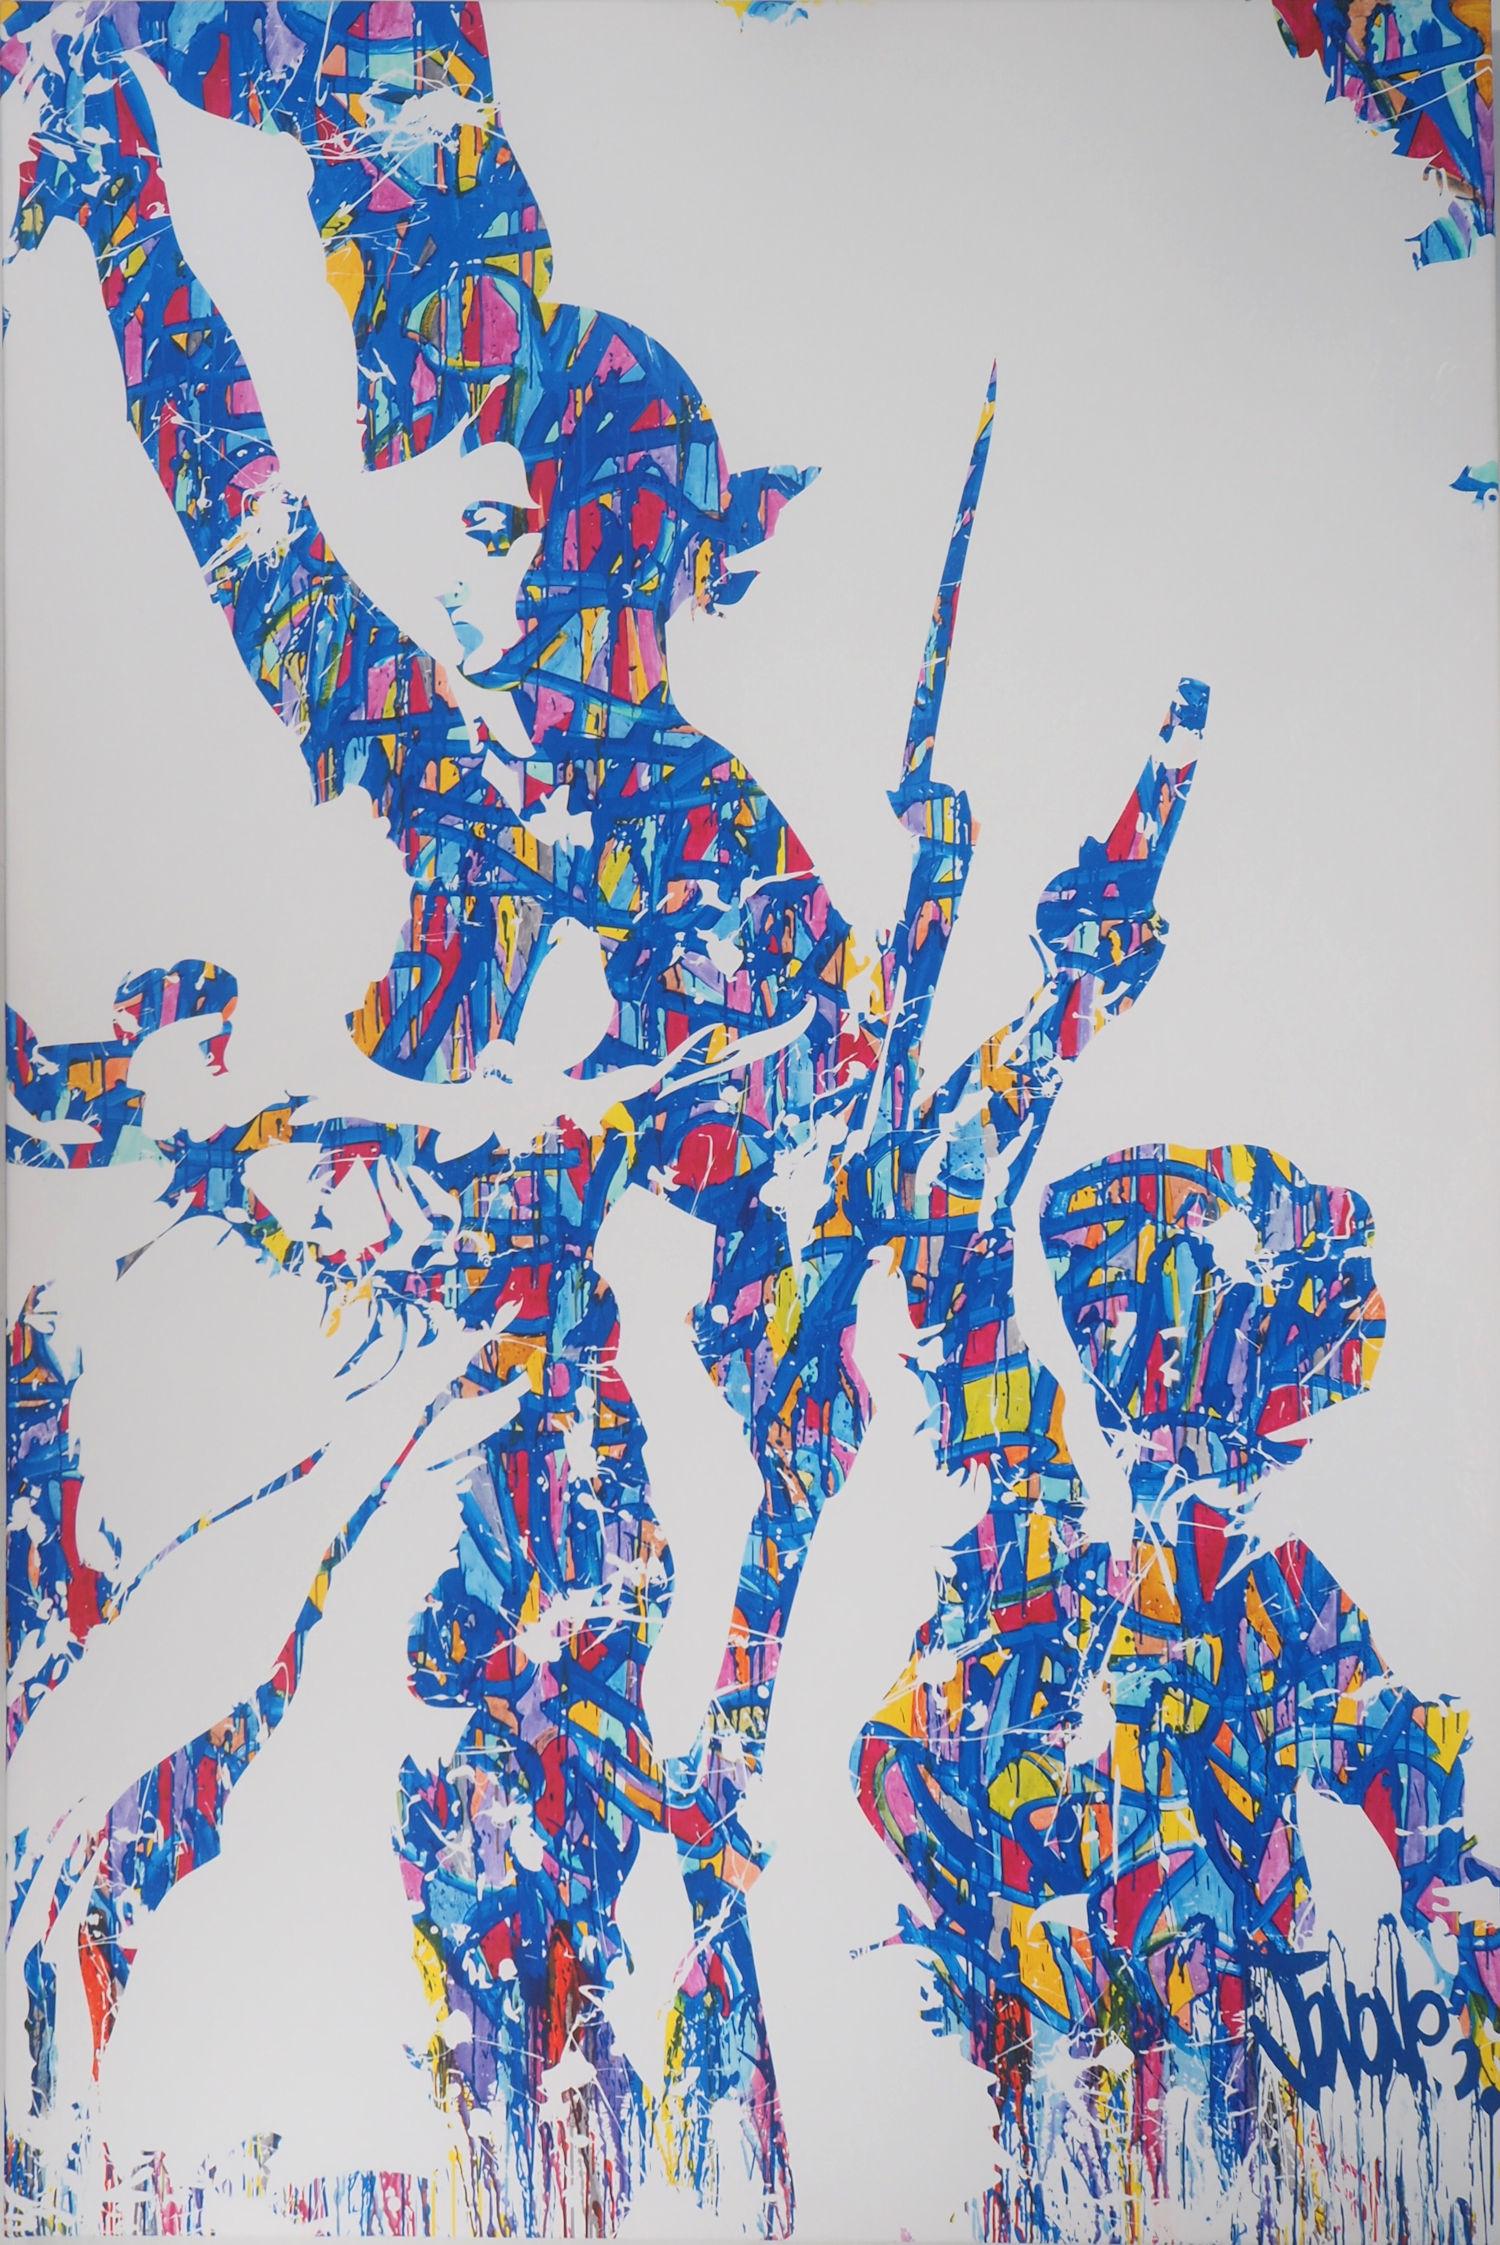 Vente Combas, Haring, Erró, Miss-Tic, Banksy, Koons : Street Art & Contemporain  chez Sadde - Dijon : 295 lots